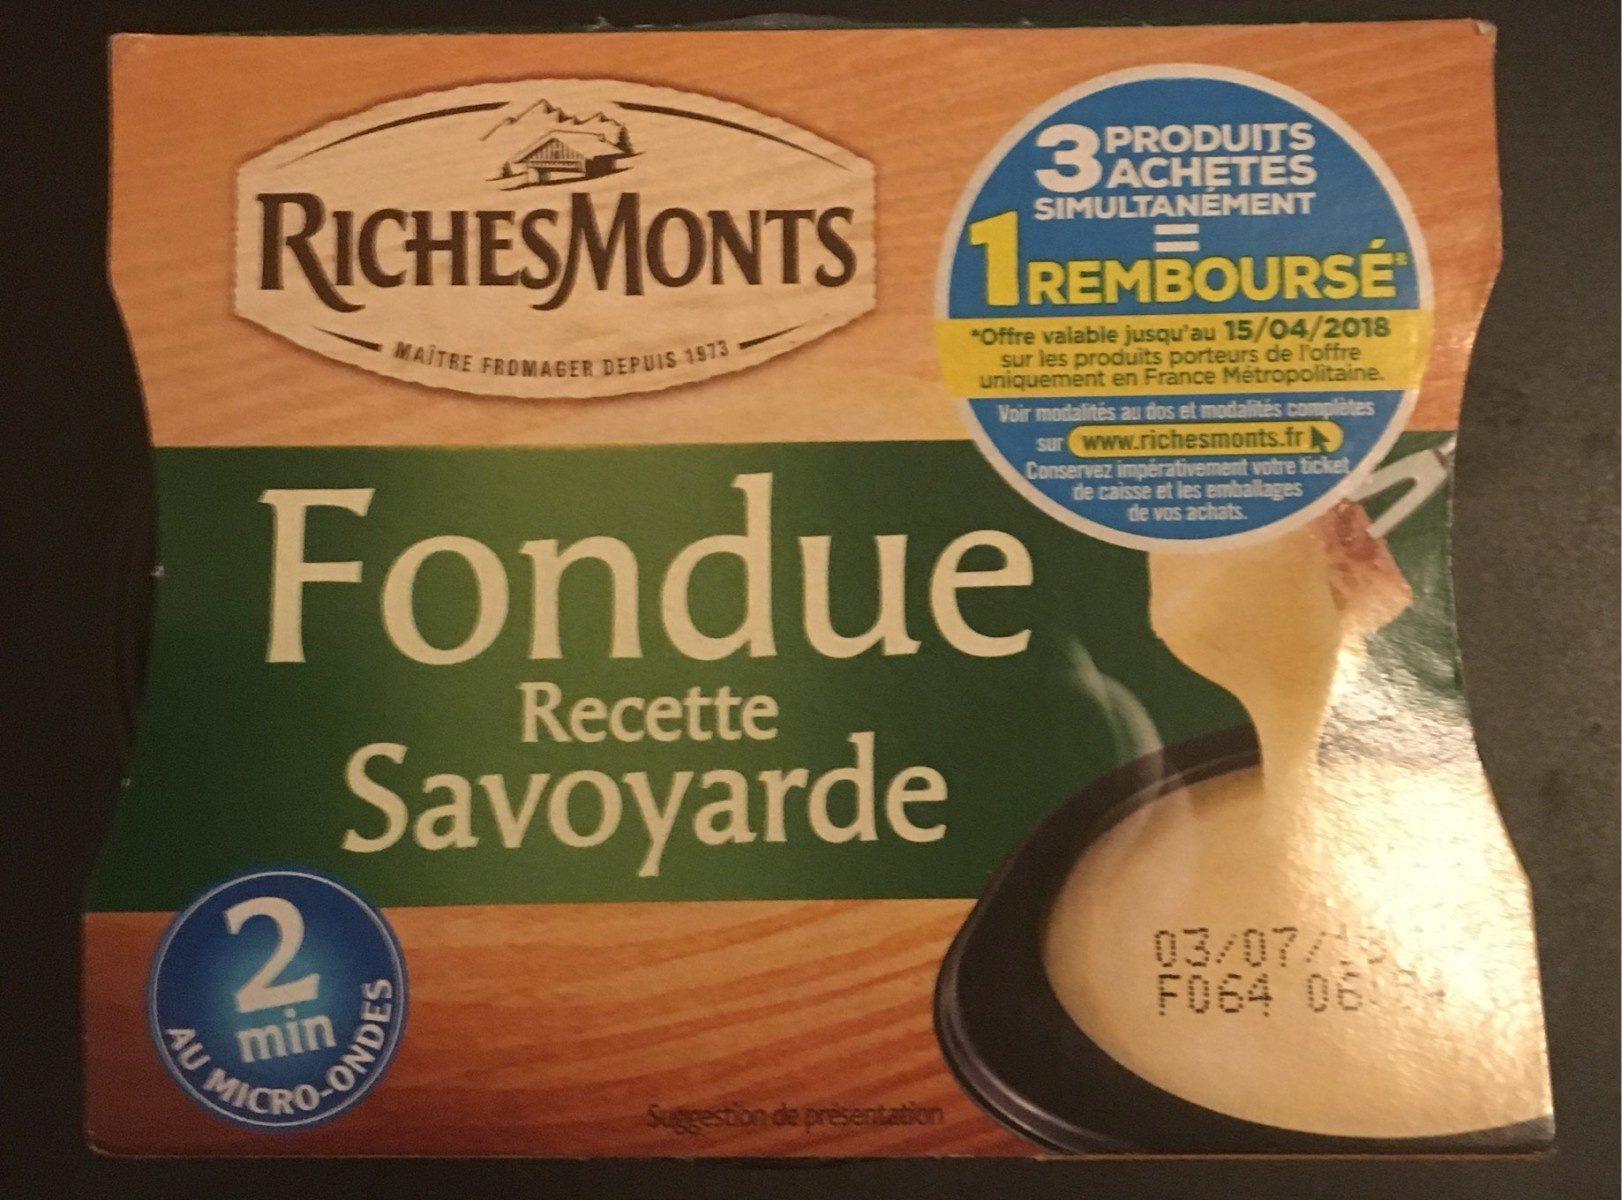 Fondue Recette Savoyarde150g - Product - fr